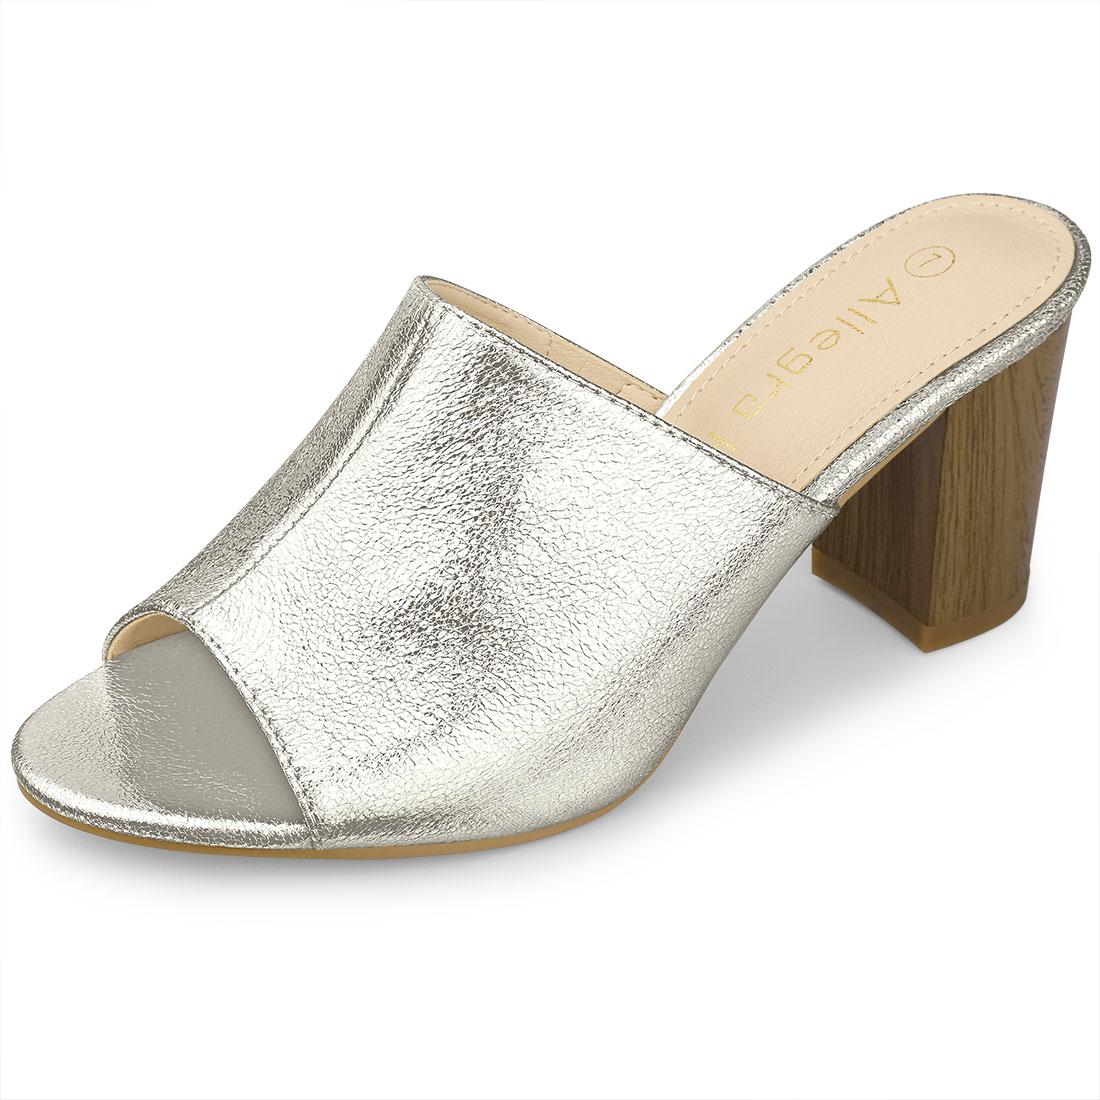 Allegra K Women's Open Toe Slide Chunky Metallic Heels Sandals Silver US 8.5